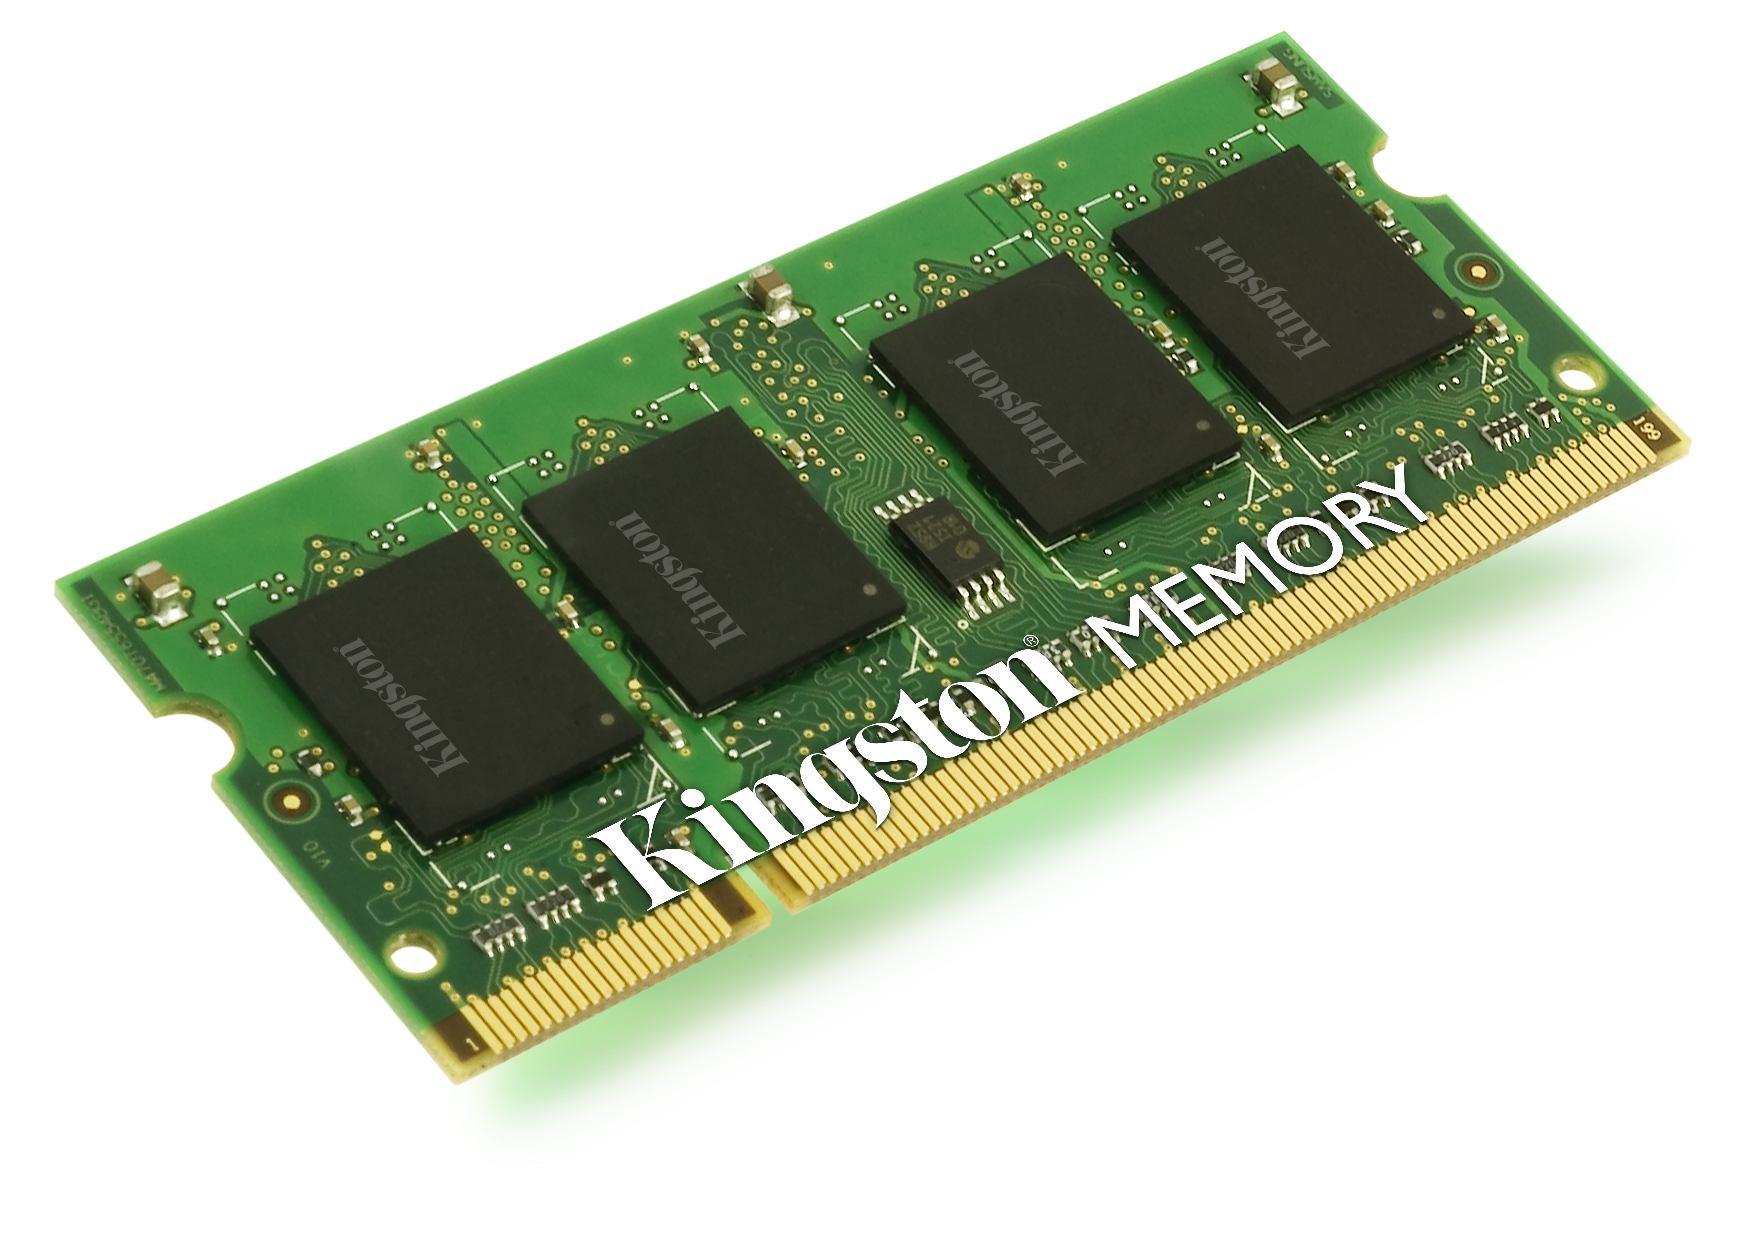 Kingston Technology Ktt667d2 2g System Ddr2 2gb Memory Sodimm